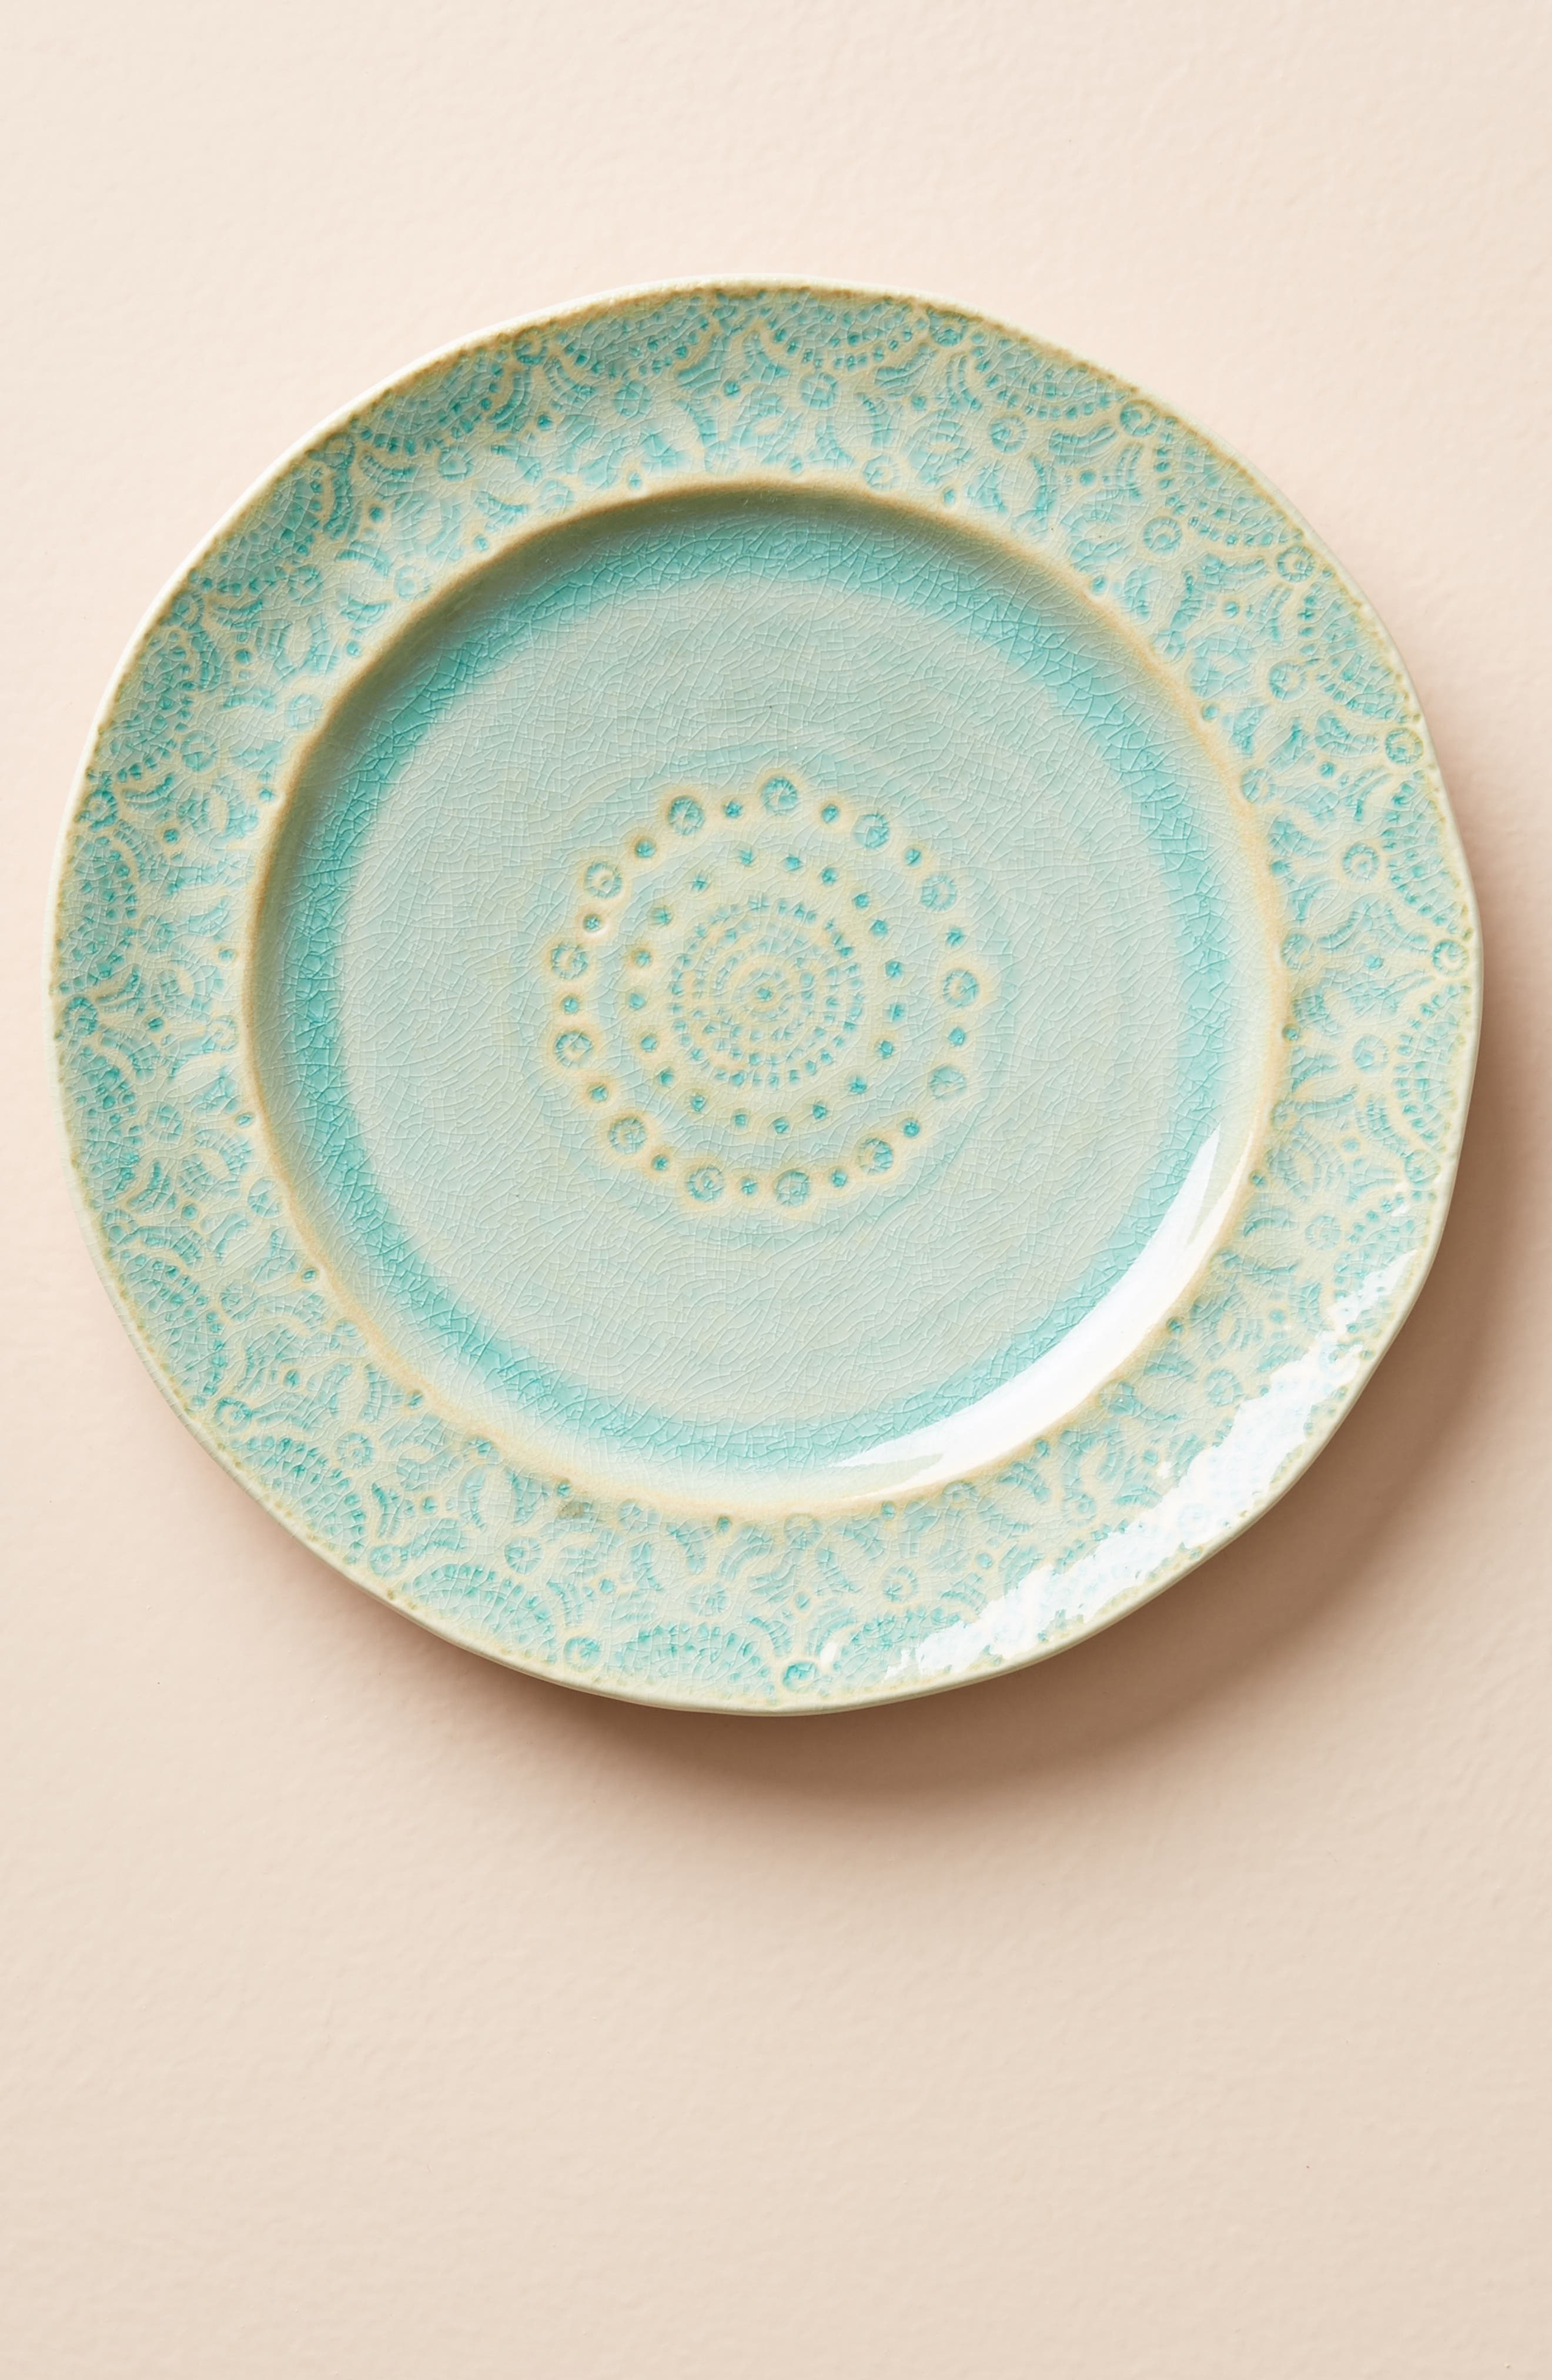 Anthropologie Old Havana Stoneware Side Plate